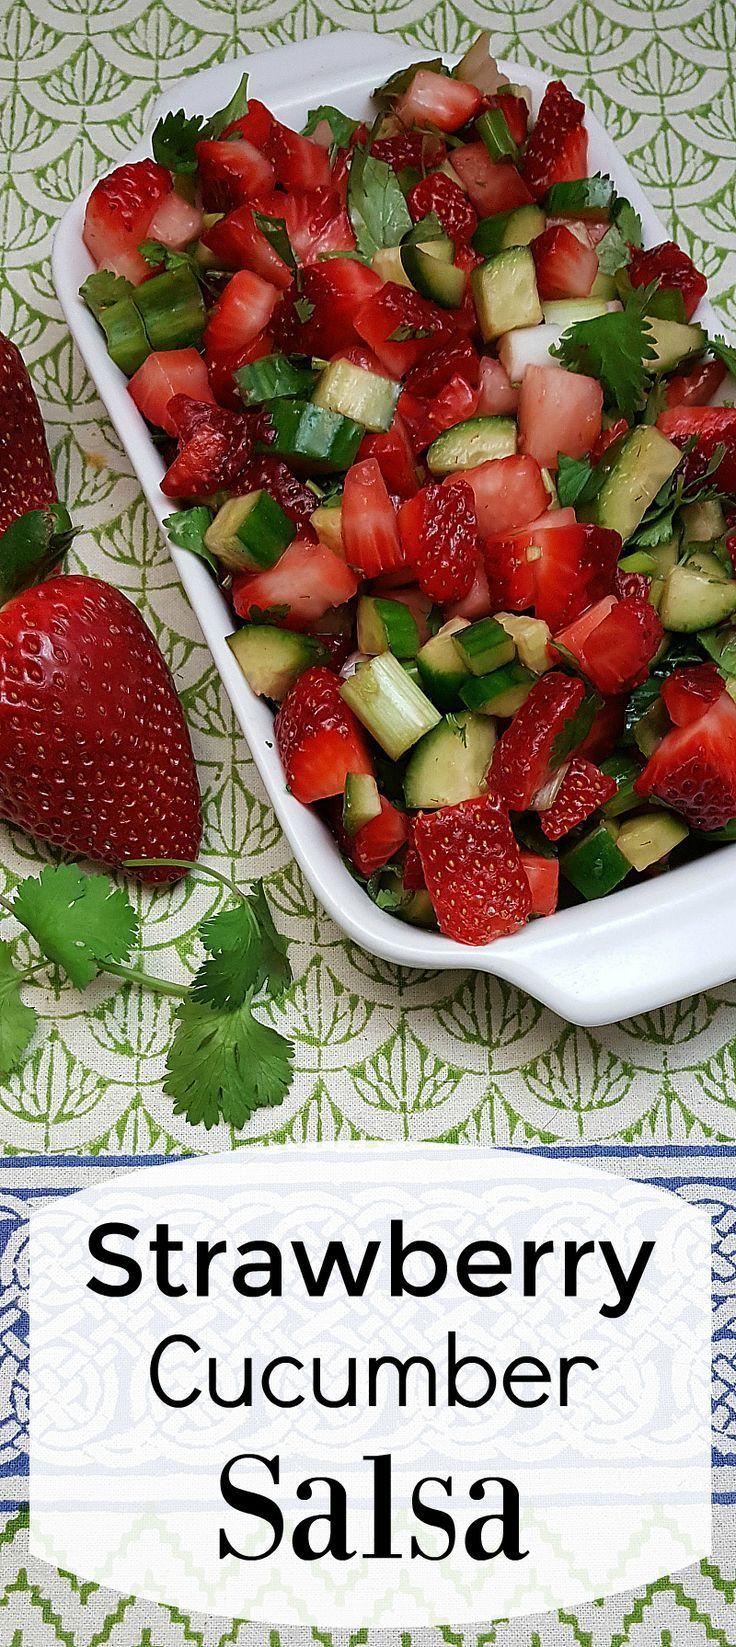 Strawberry Cucumber Salsa